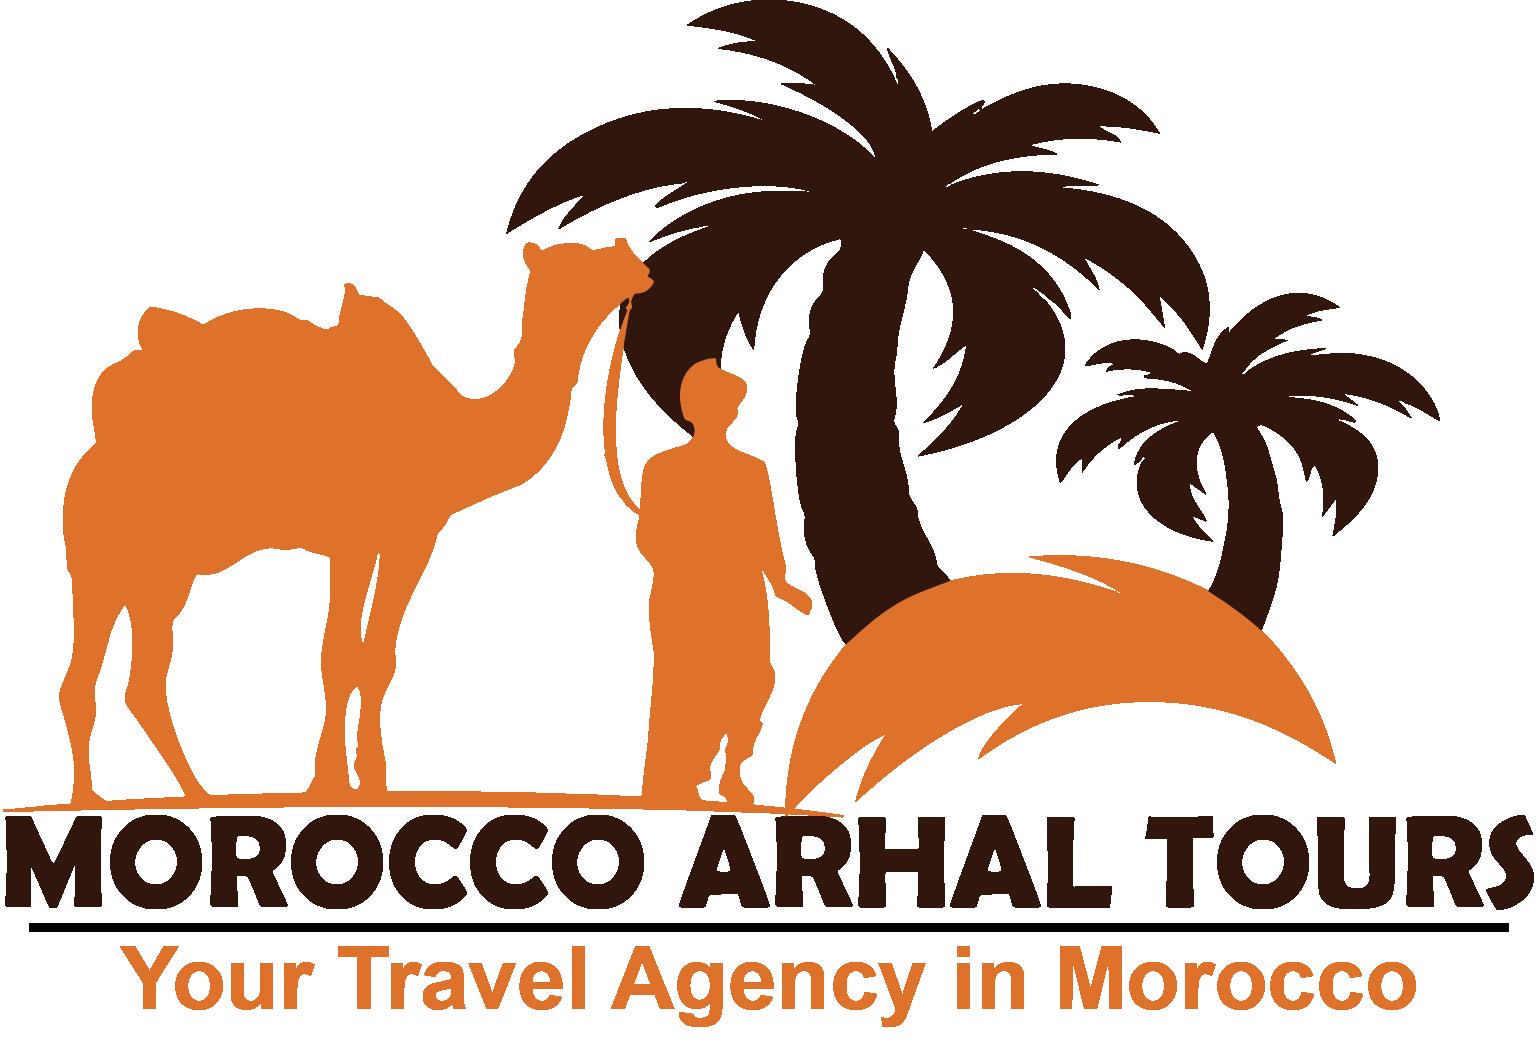 Morocco Arhal Tours